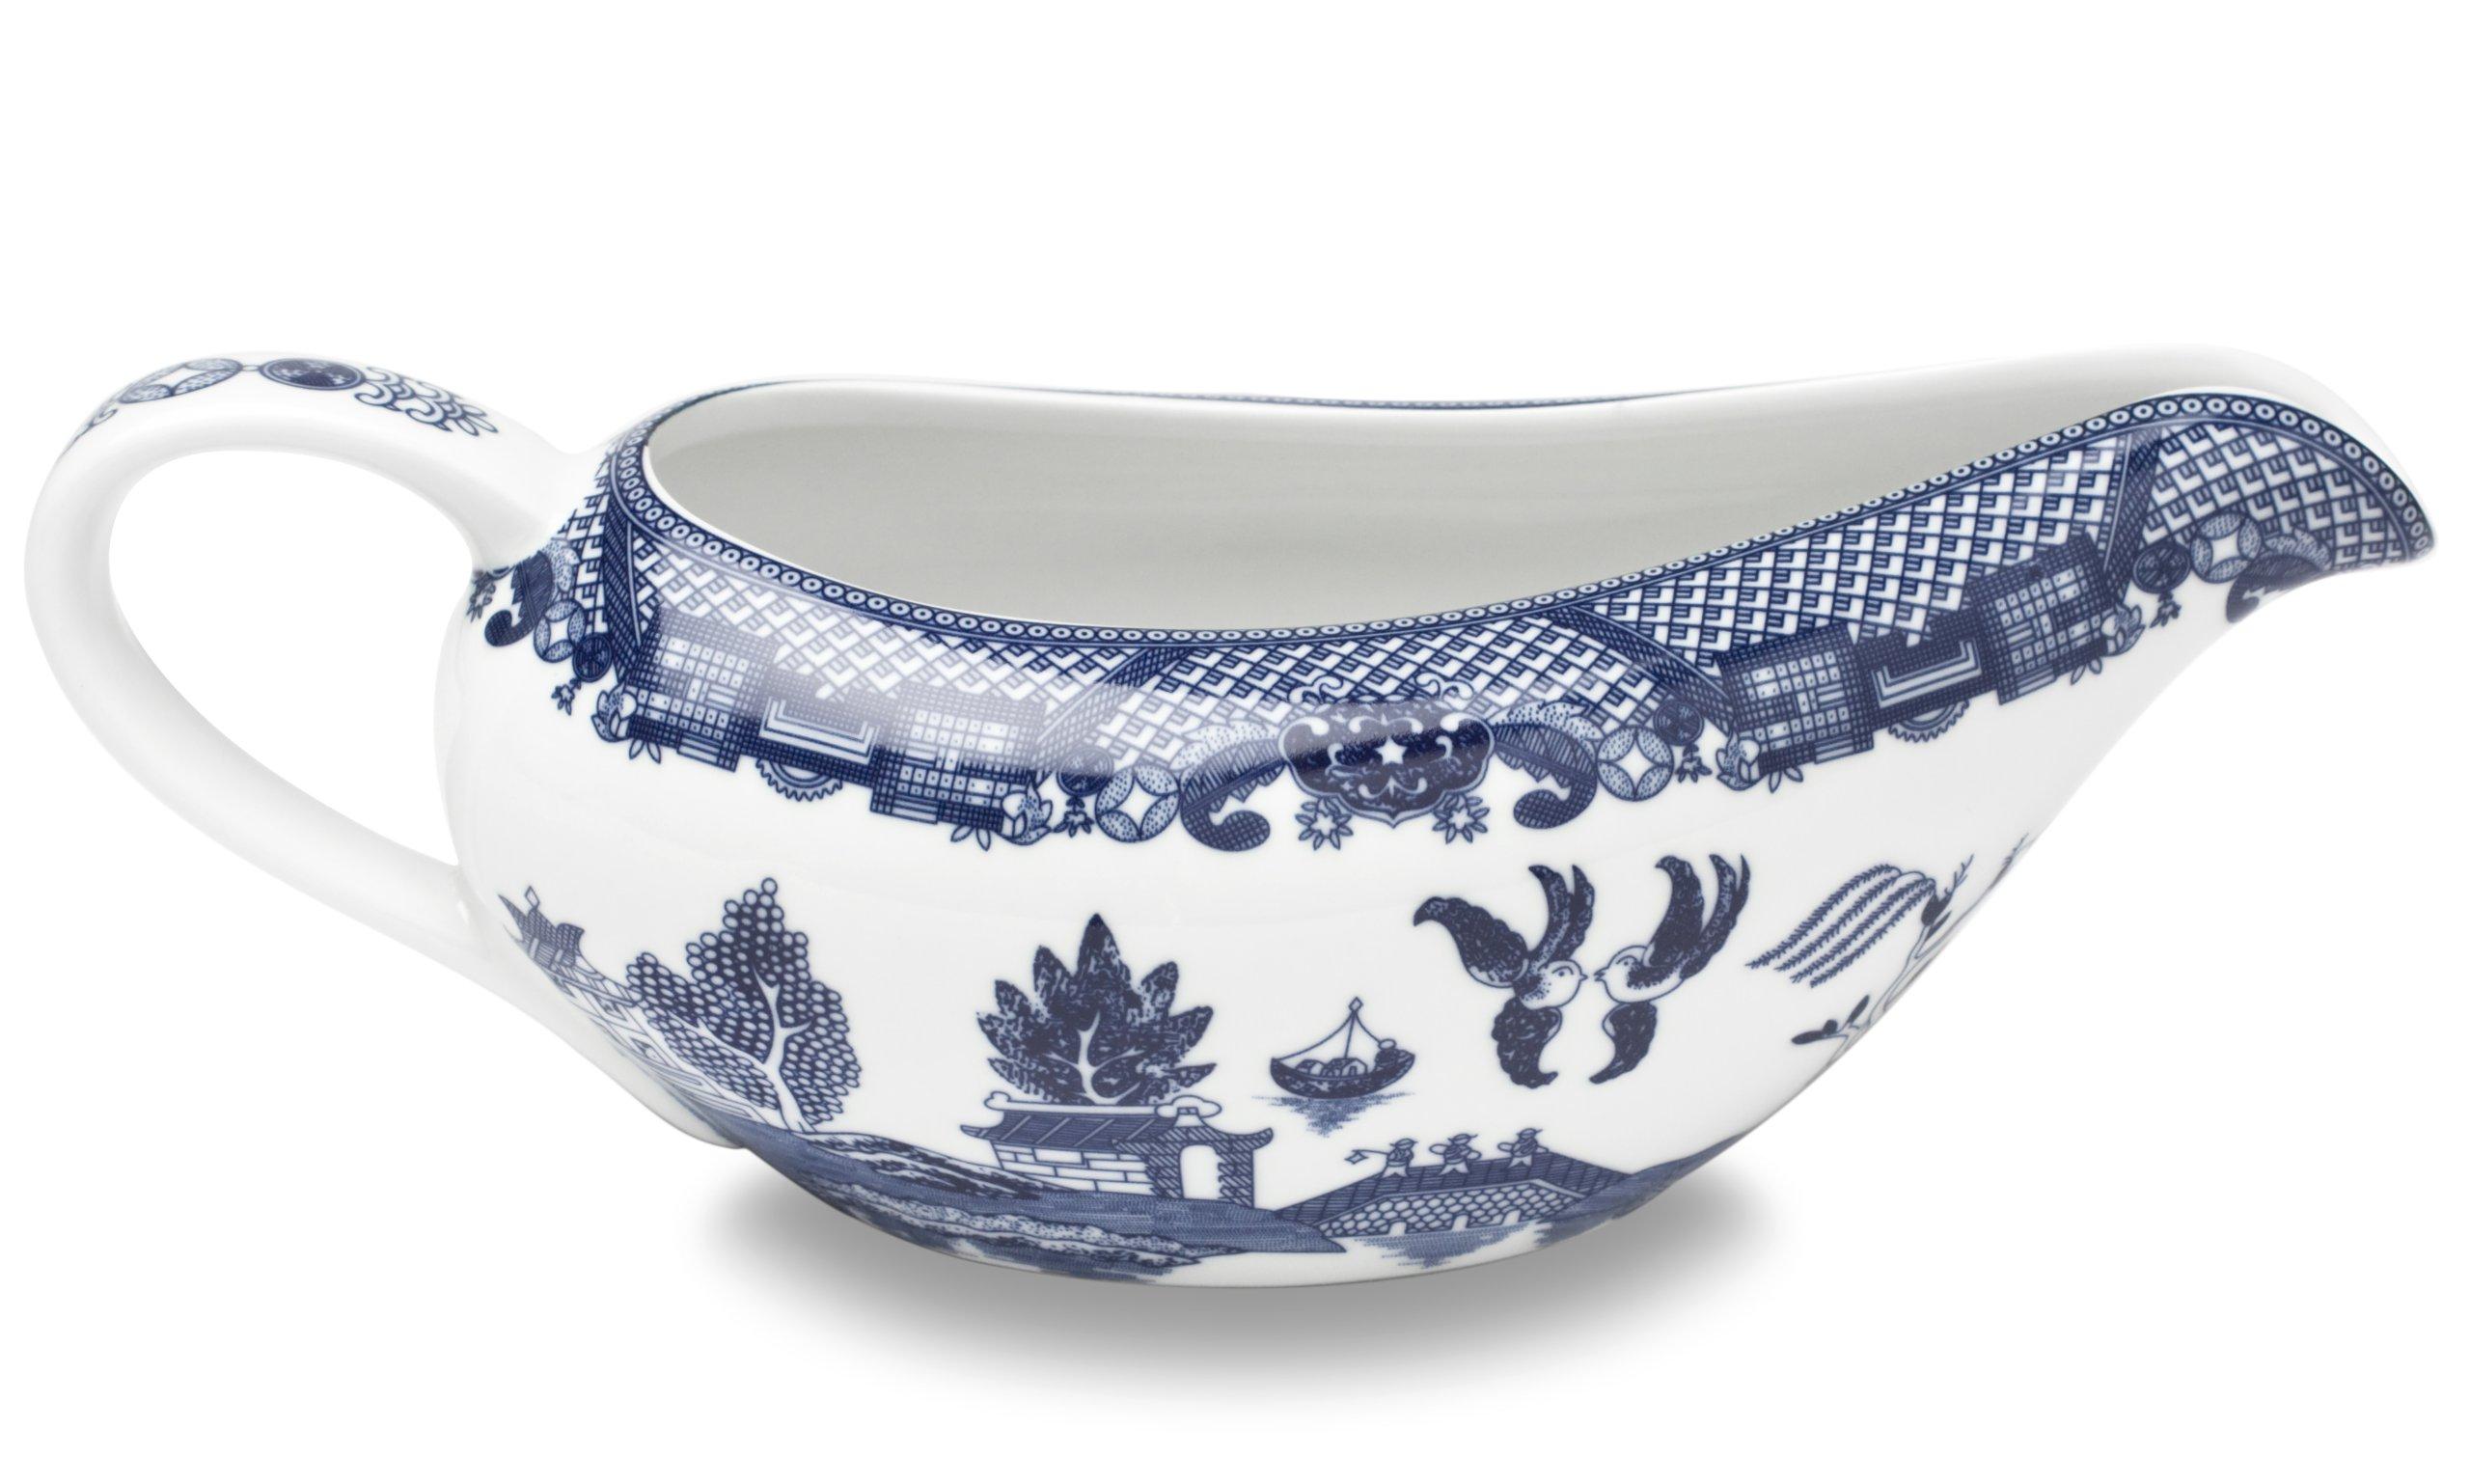 HIC Harold Import Co. YK-337 Blue Willow Gravy Boat, Fine White Porcelain, 20-Ounces